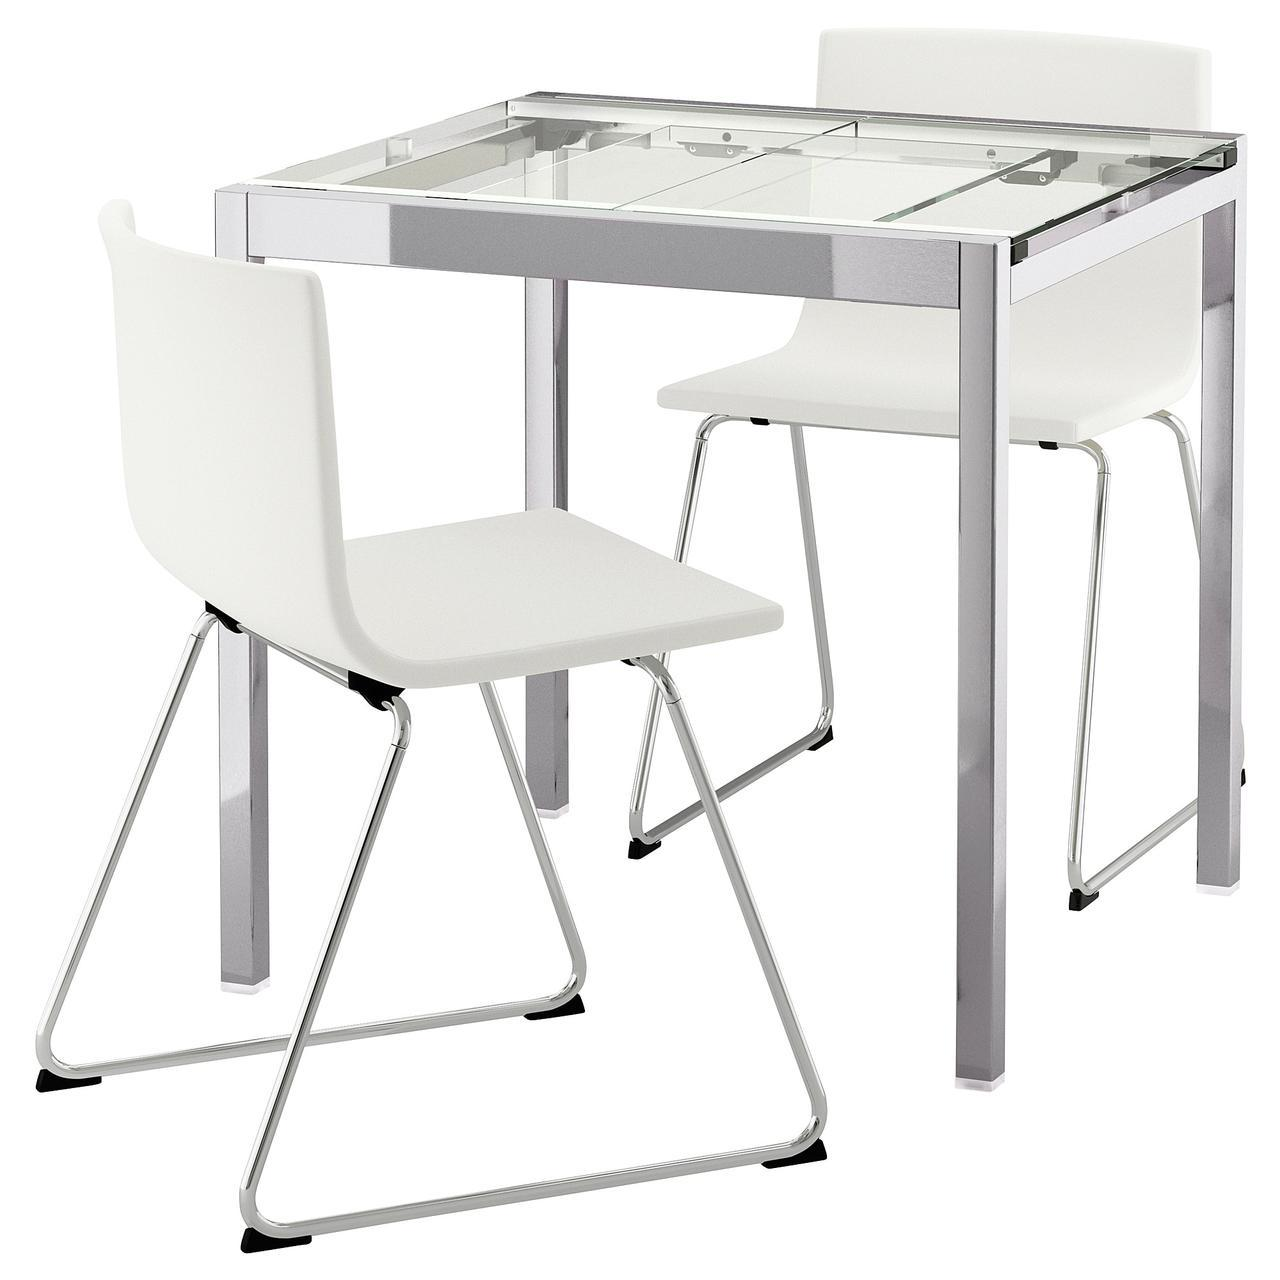 IKEA GLIVARP / BERNHARD (992.598.25) Стол и 2 стула, прозрачные, майки белые